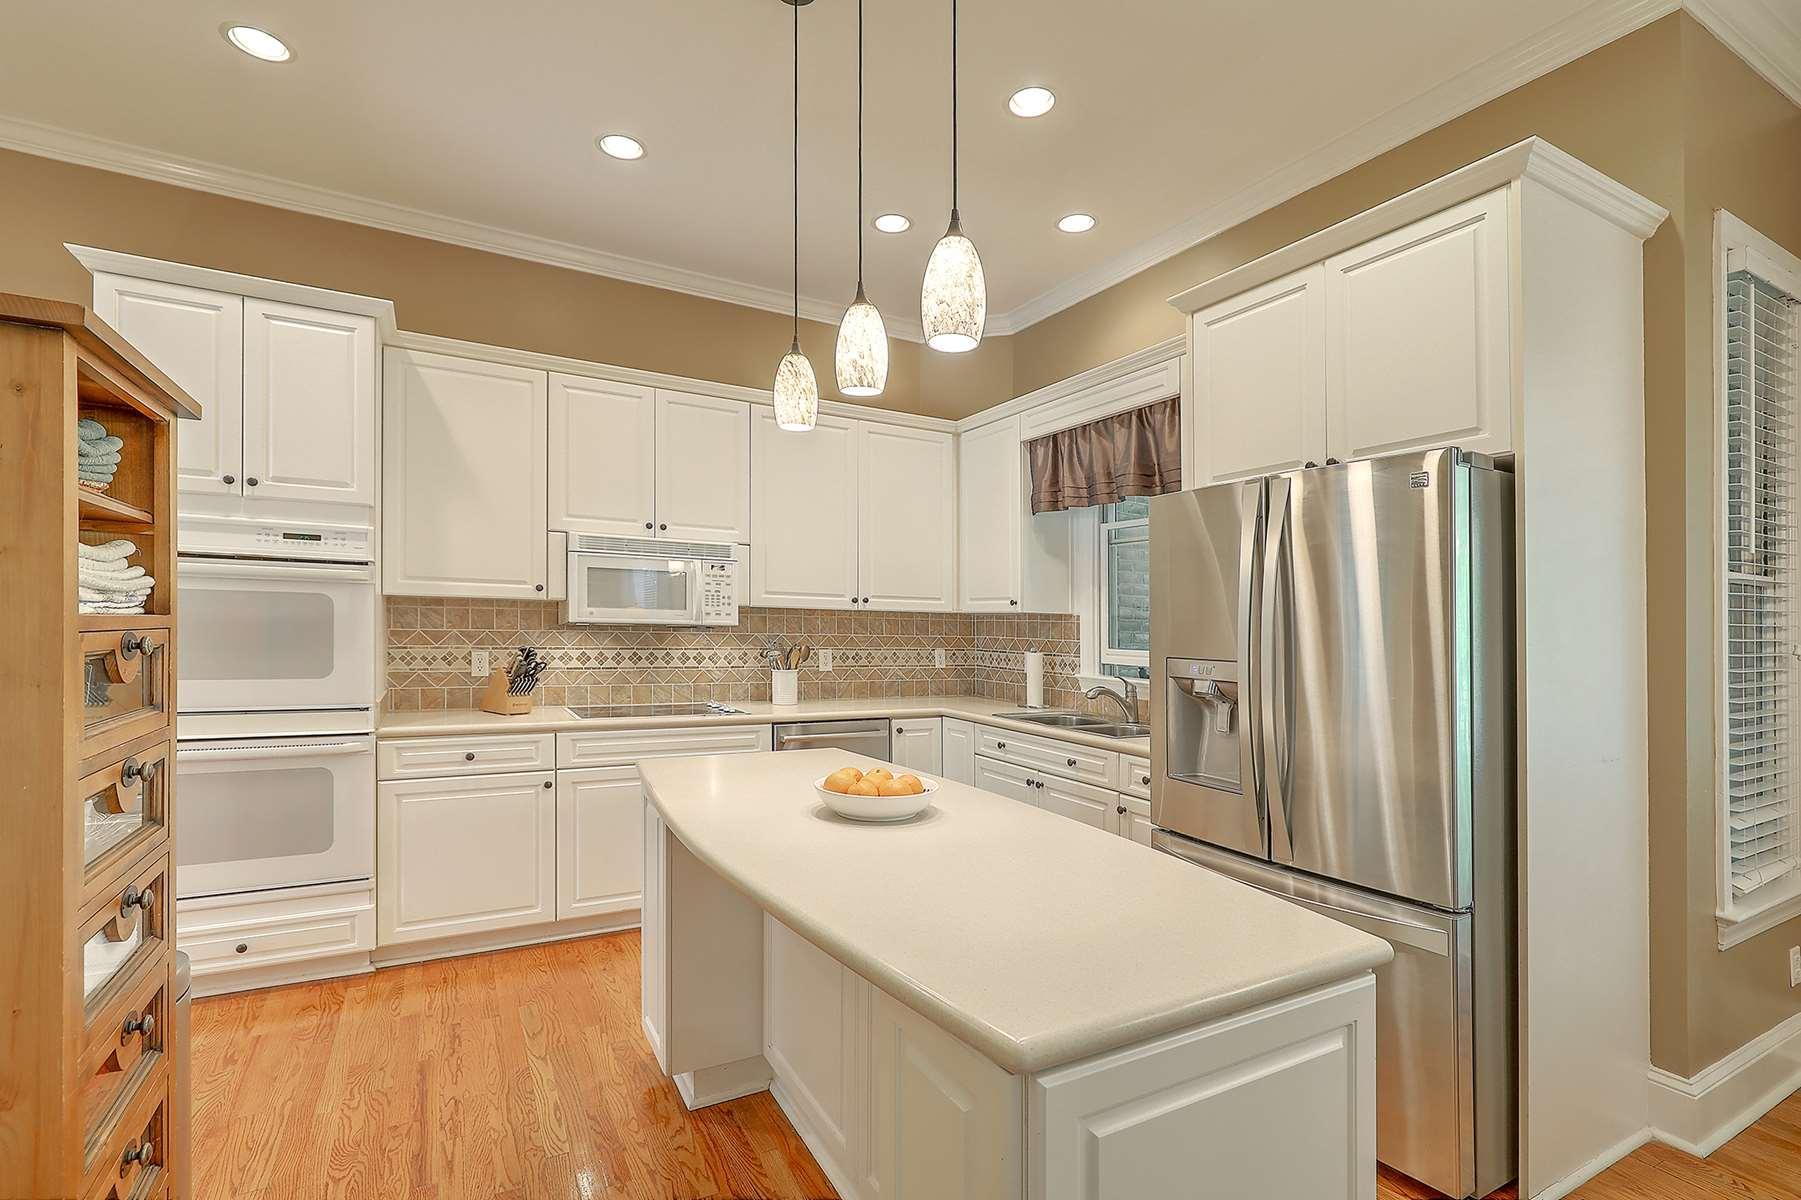 Dunes West Homes For Sale - 2961 Pignatelli, Mount Pleasant, SC - 6